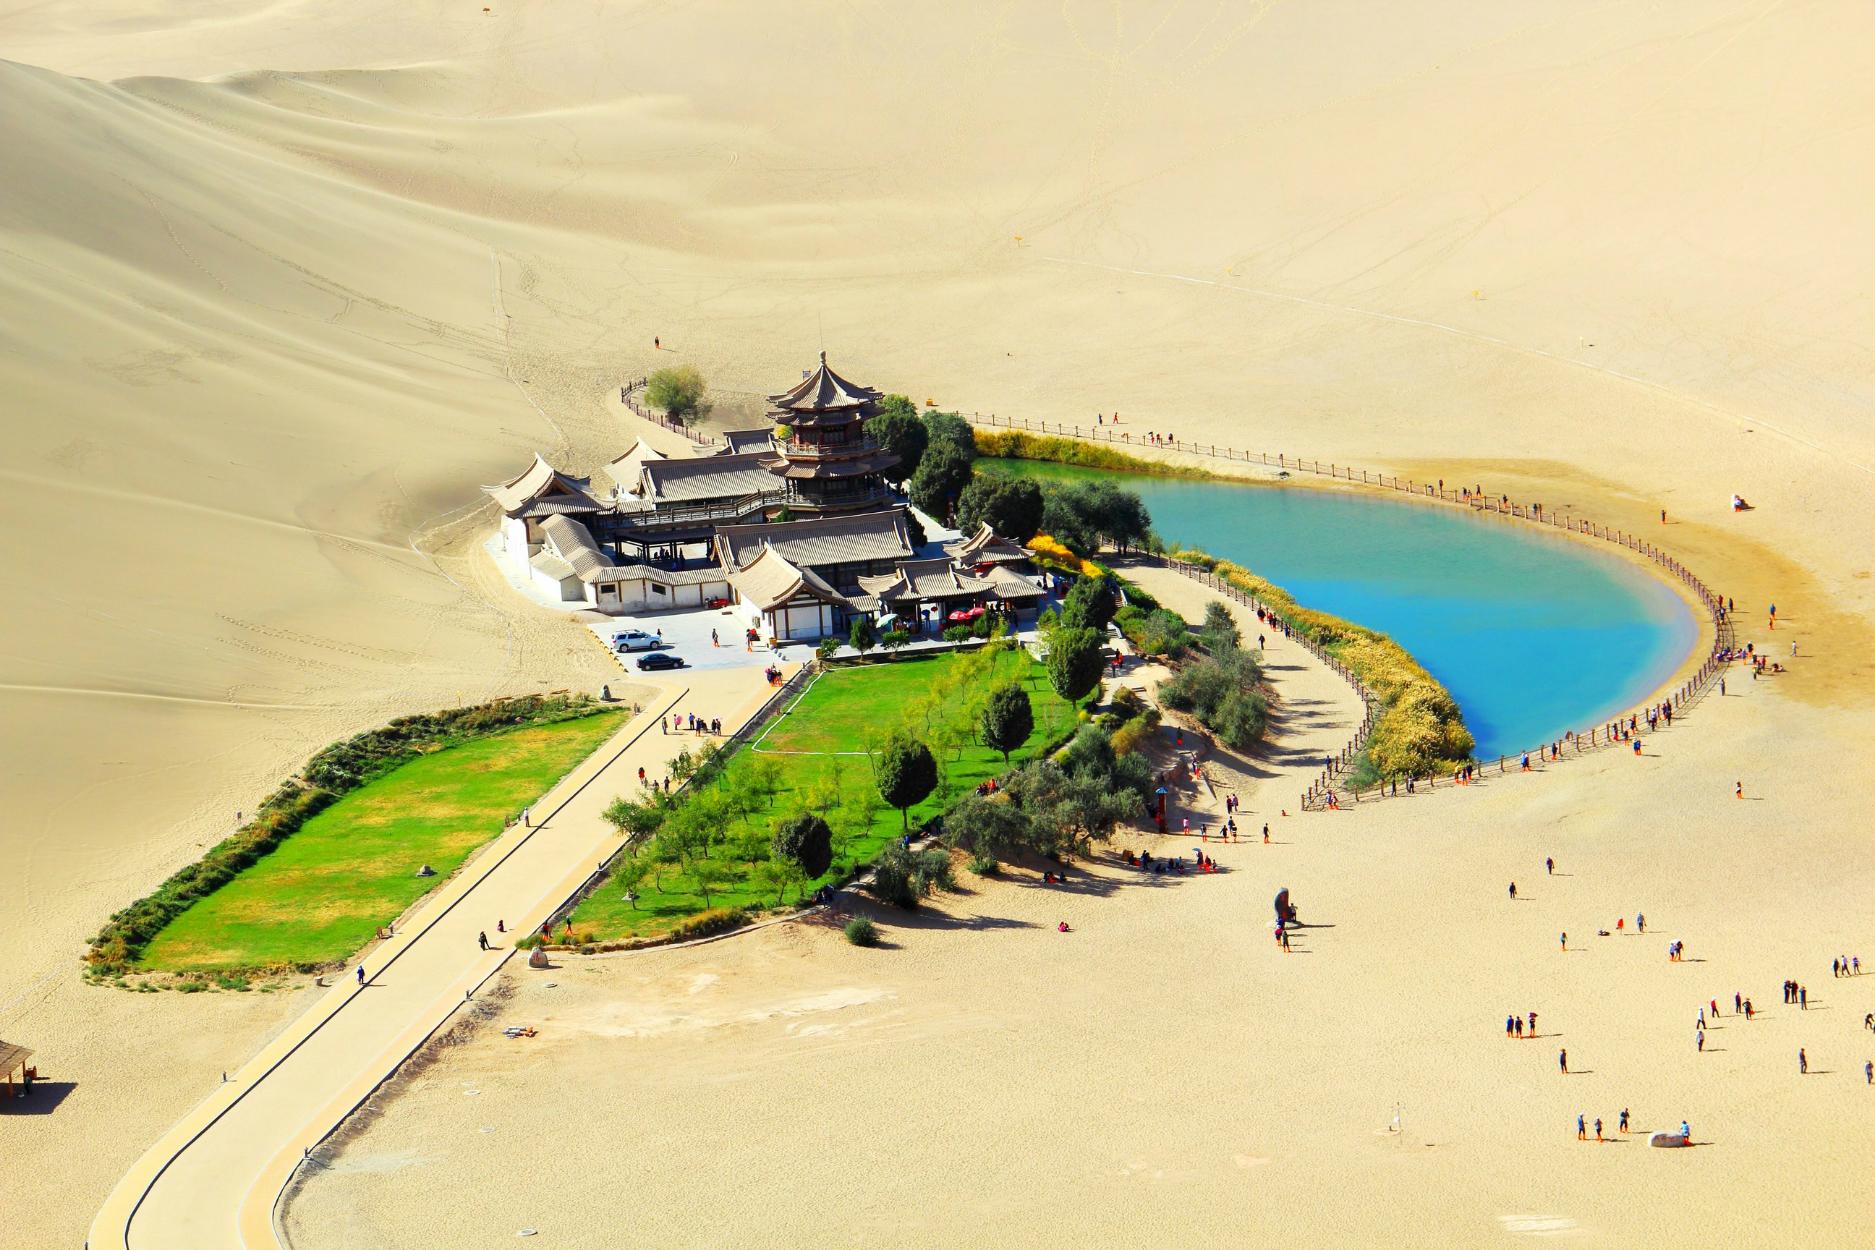 dunhuang sand